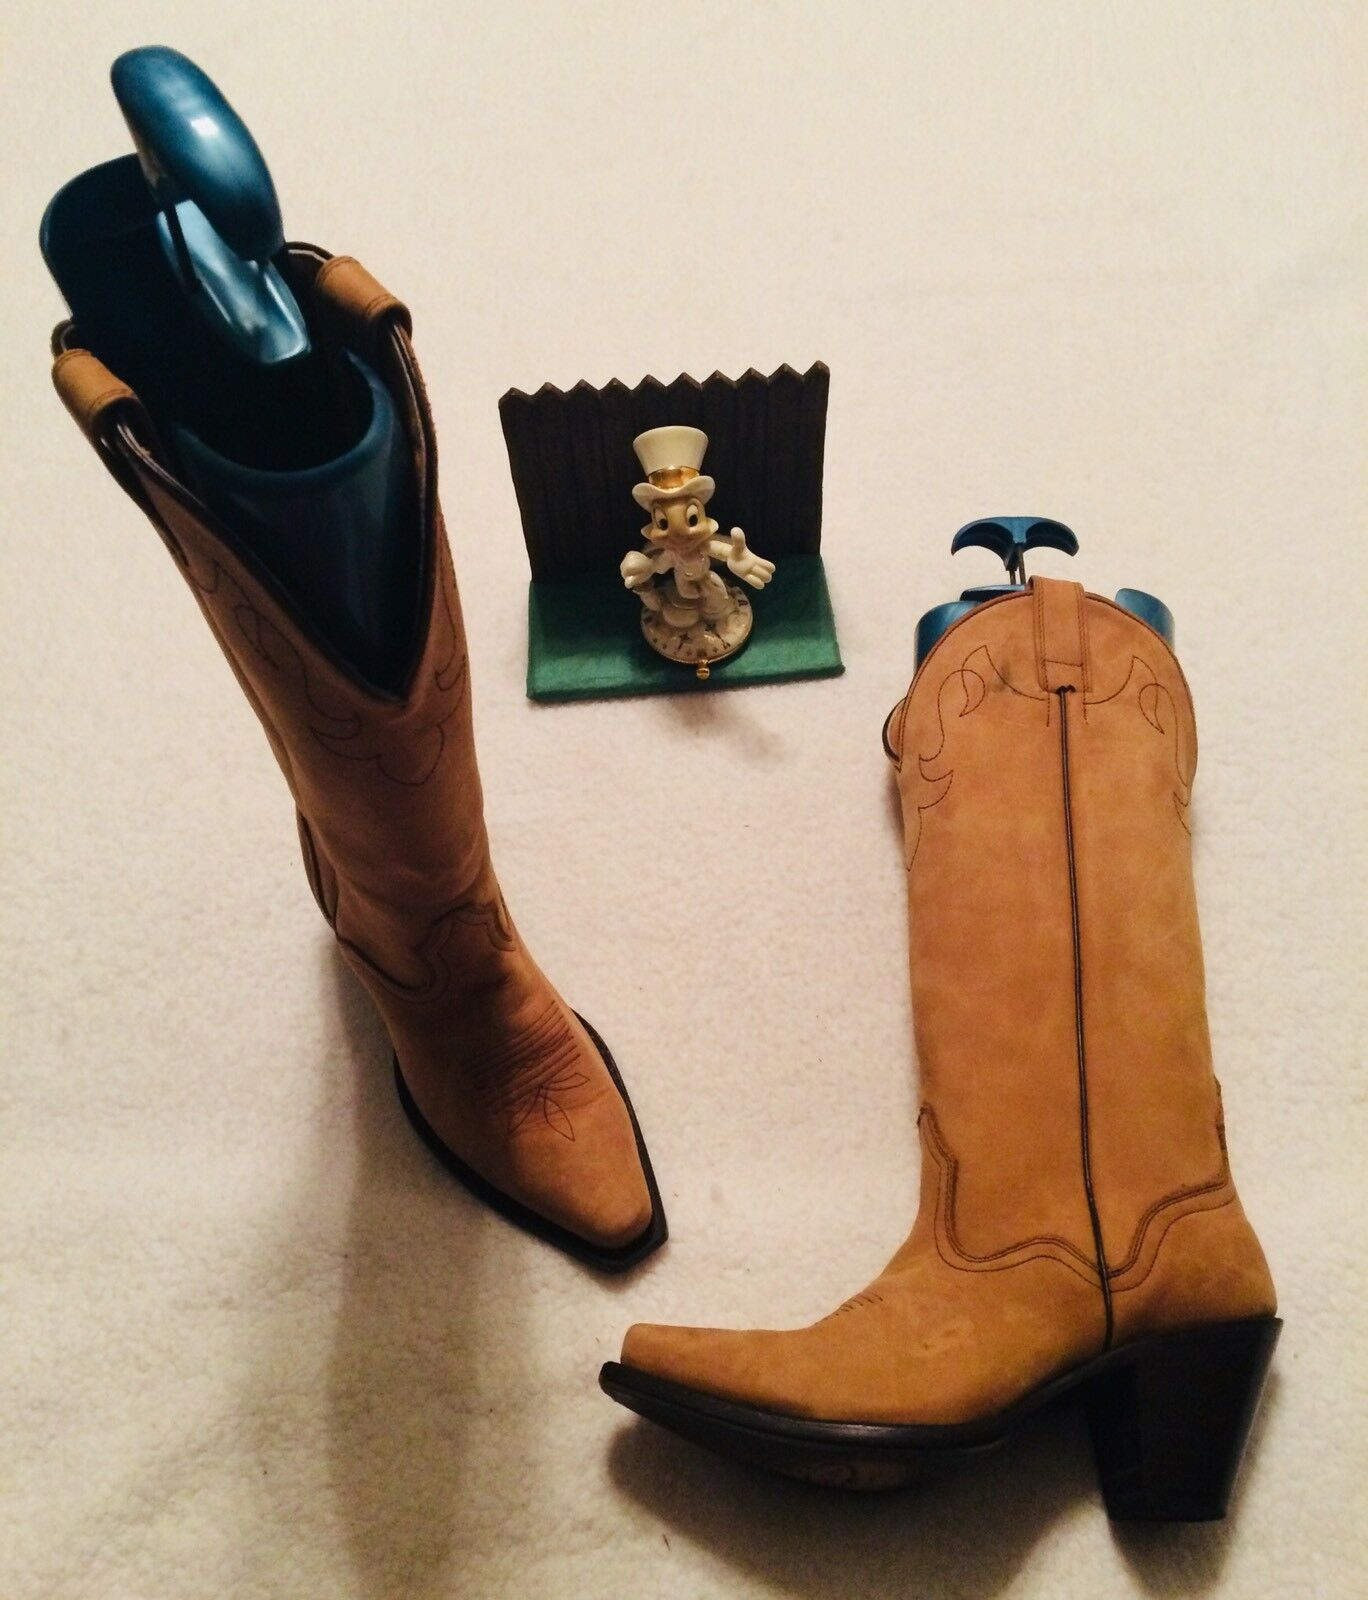 Nuova lista donna J.B.DILLON TAN LEATHER COWBOY WESTERN stivali stivali stivali SZ 7 B 7B VERY NICE 26064  marca